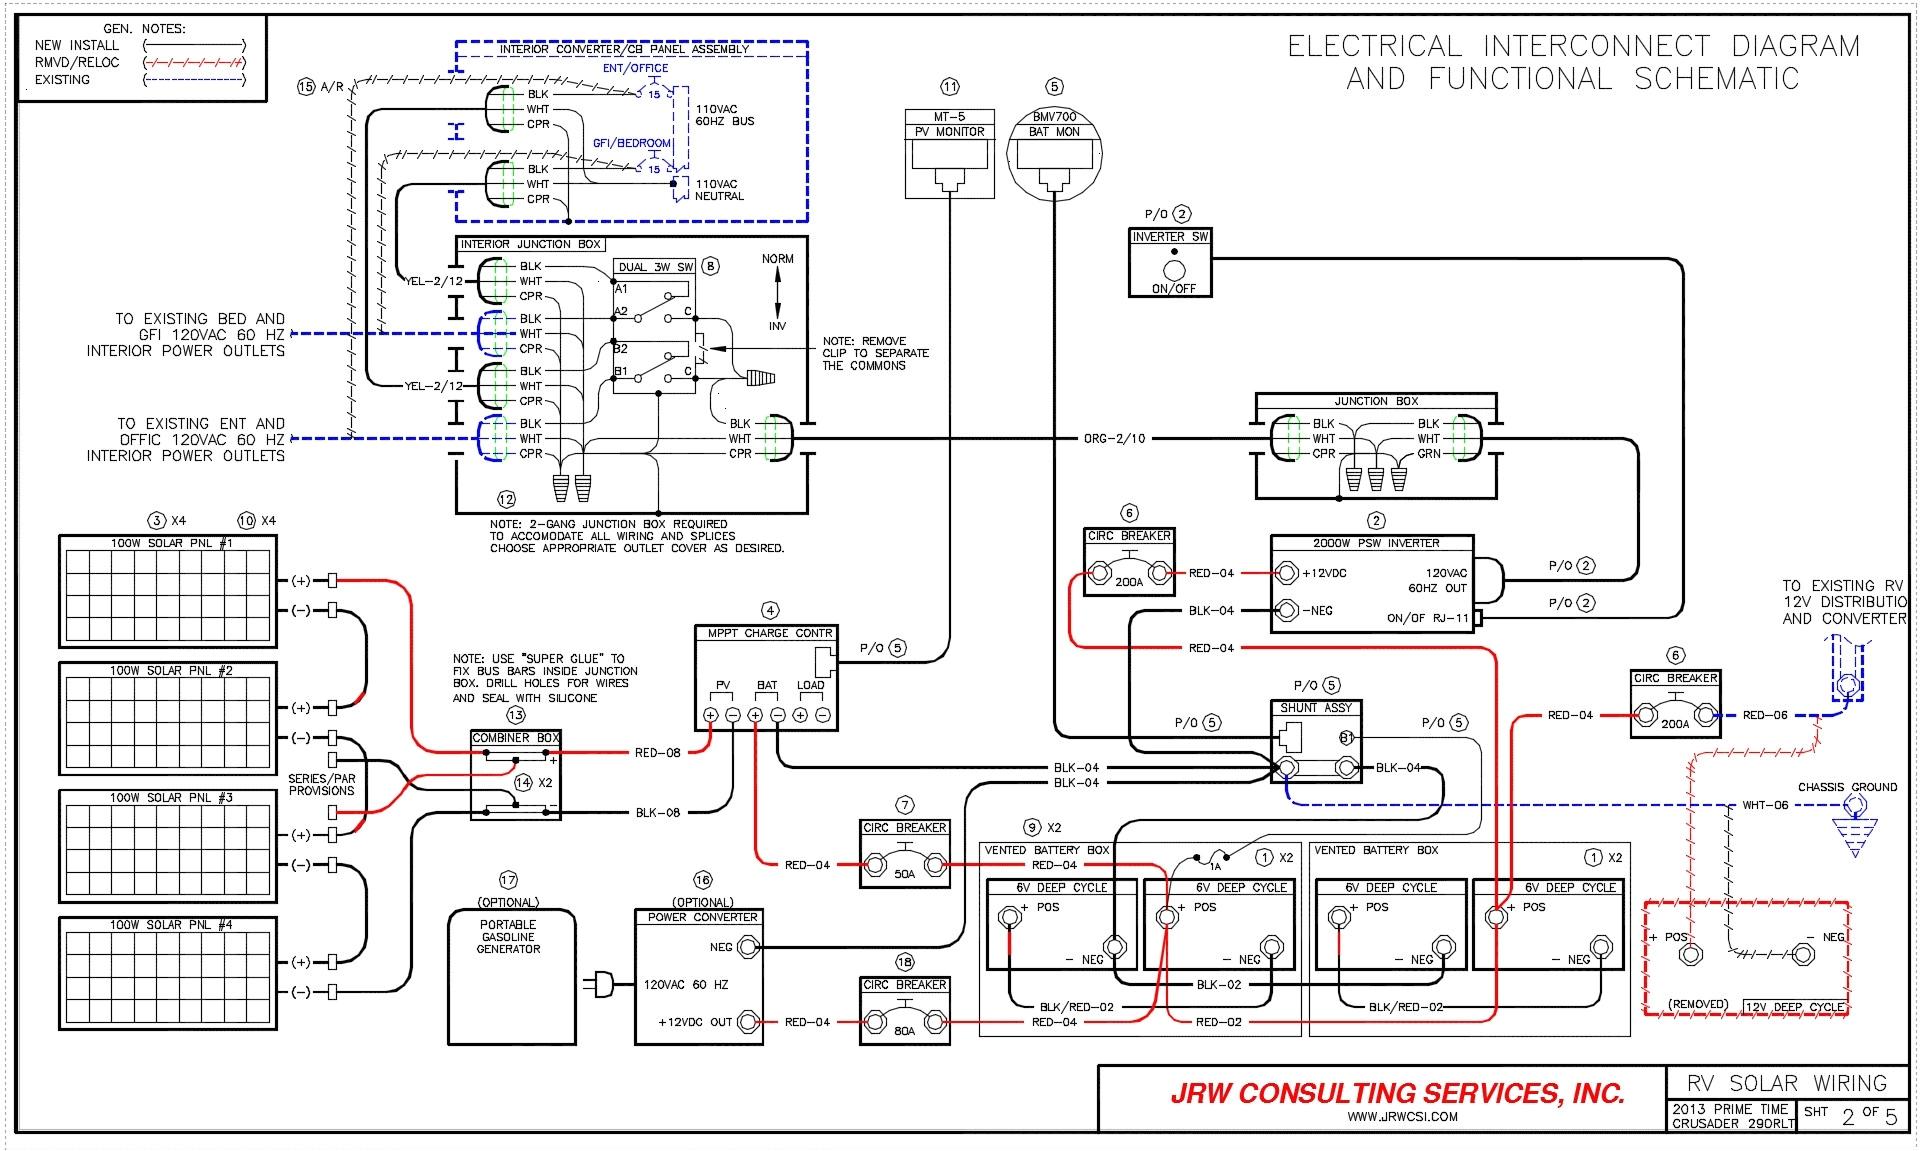 rv hdtv wiring diagram wiring diagram expert wiring diagram for rv hot water heater rv hdtv